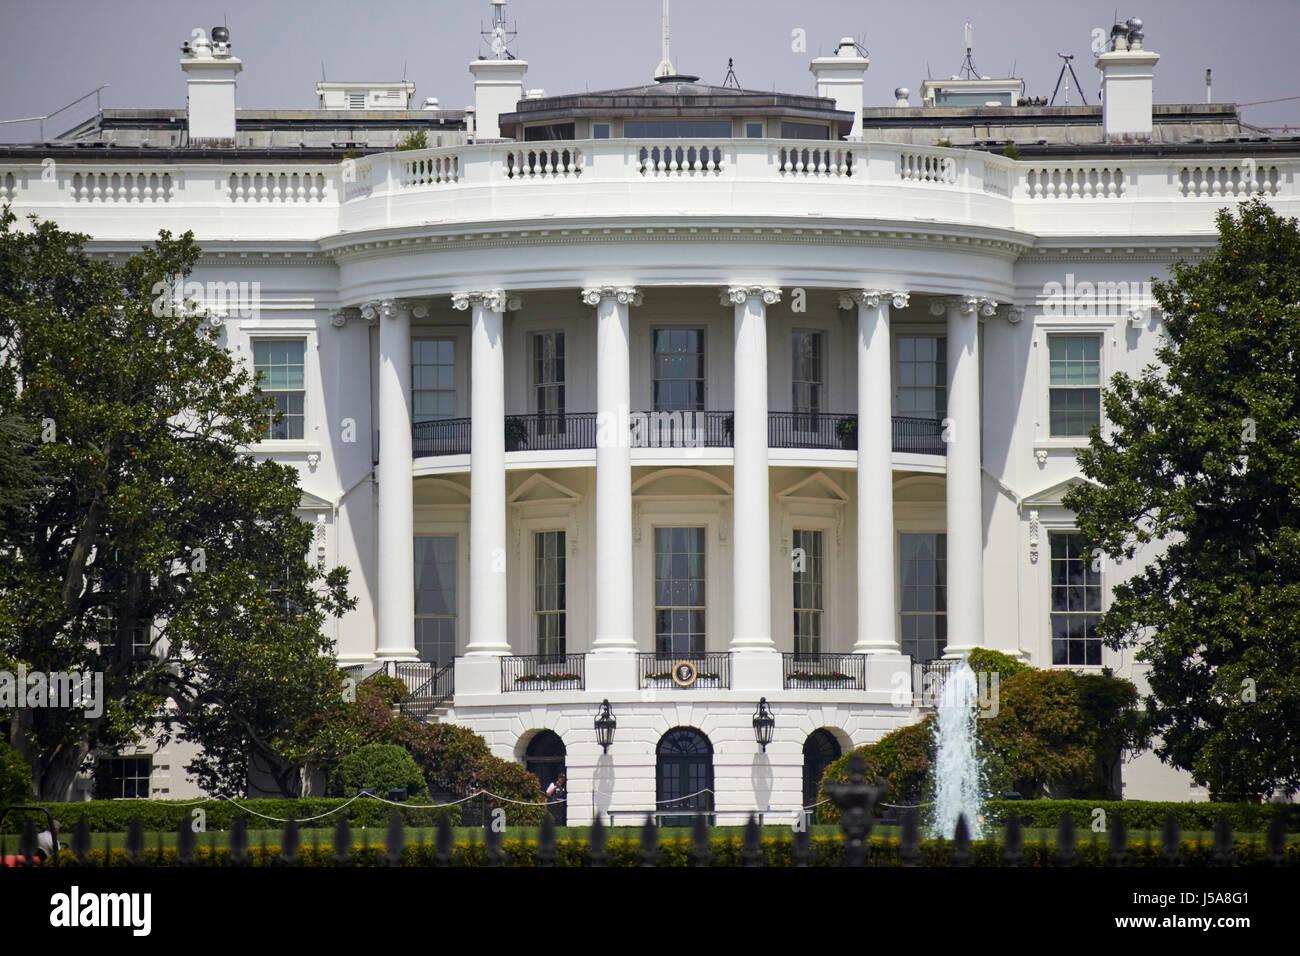 southern facade of the white house Washington DC USA - Stock Image